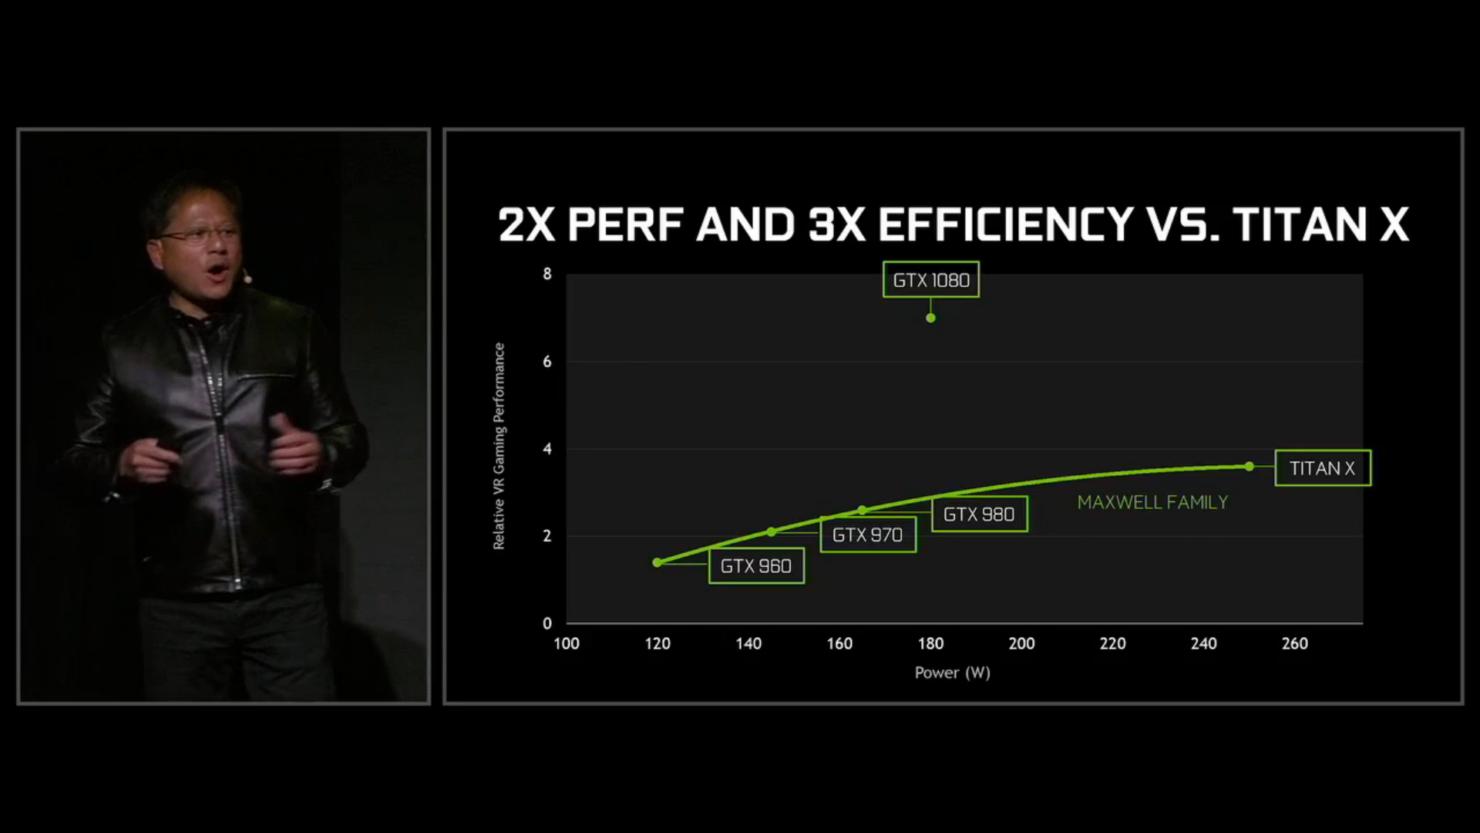 gtx-1080-2x-performance-and-3x-performance-efficiency